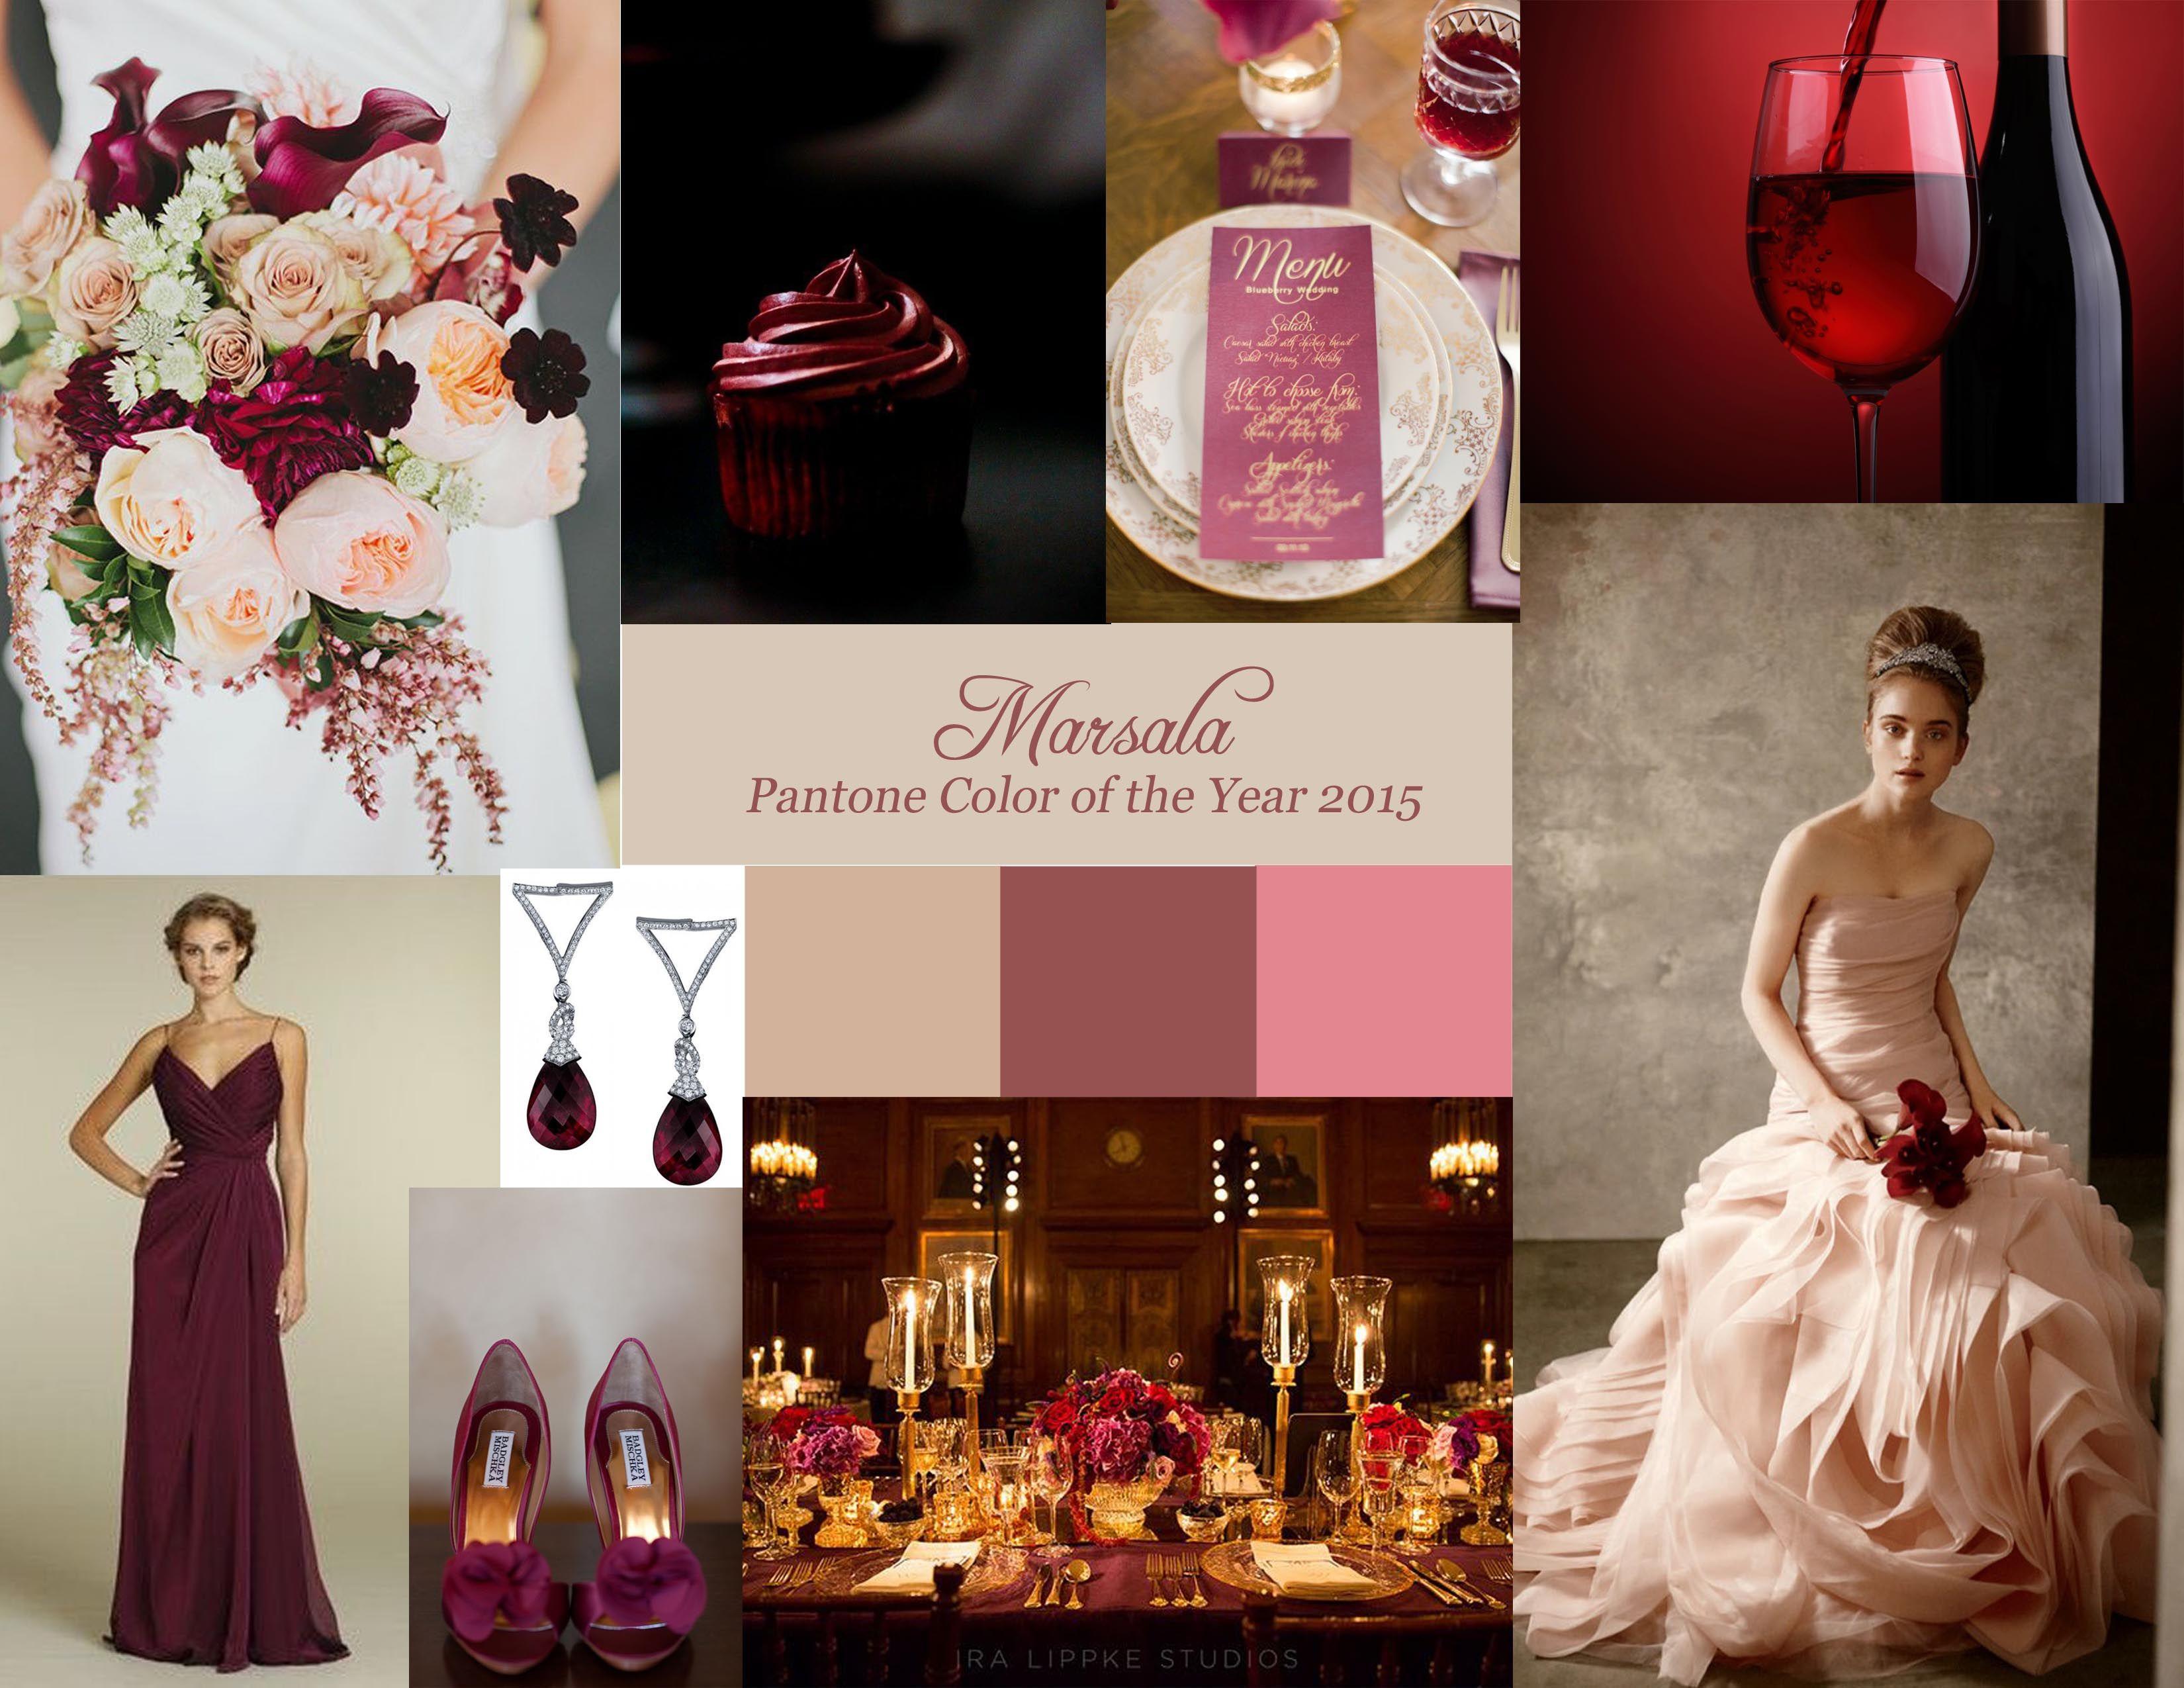 Marsala Wedding Decor | ... Creative Weddings - Planning and Decor ...